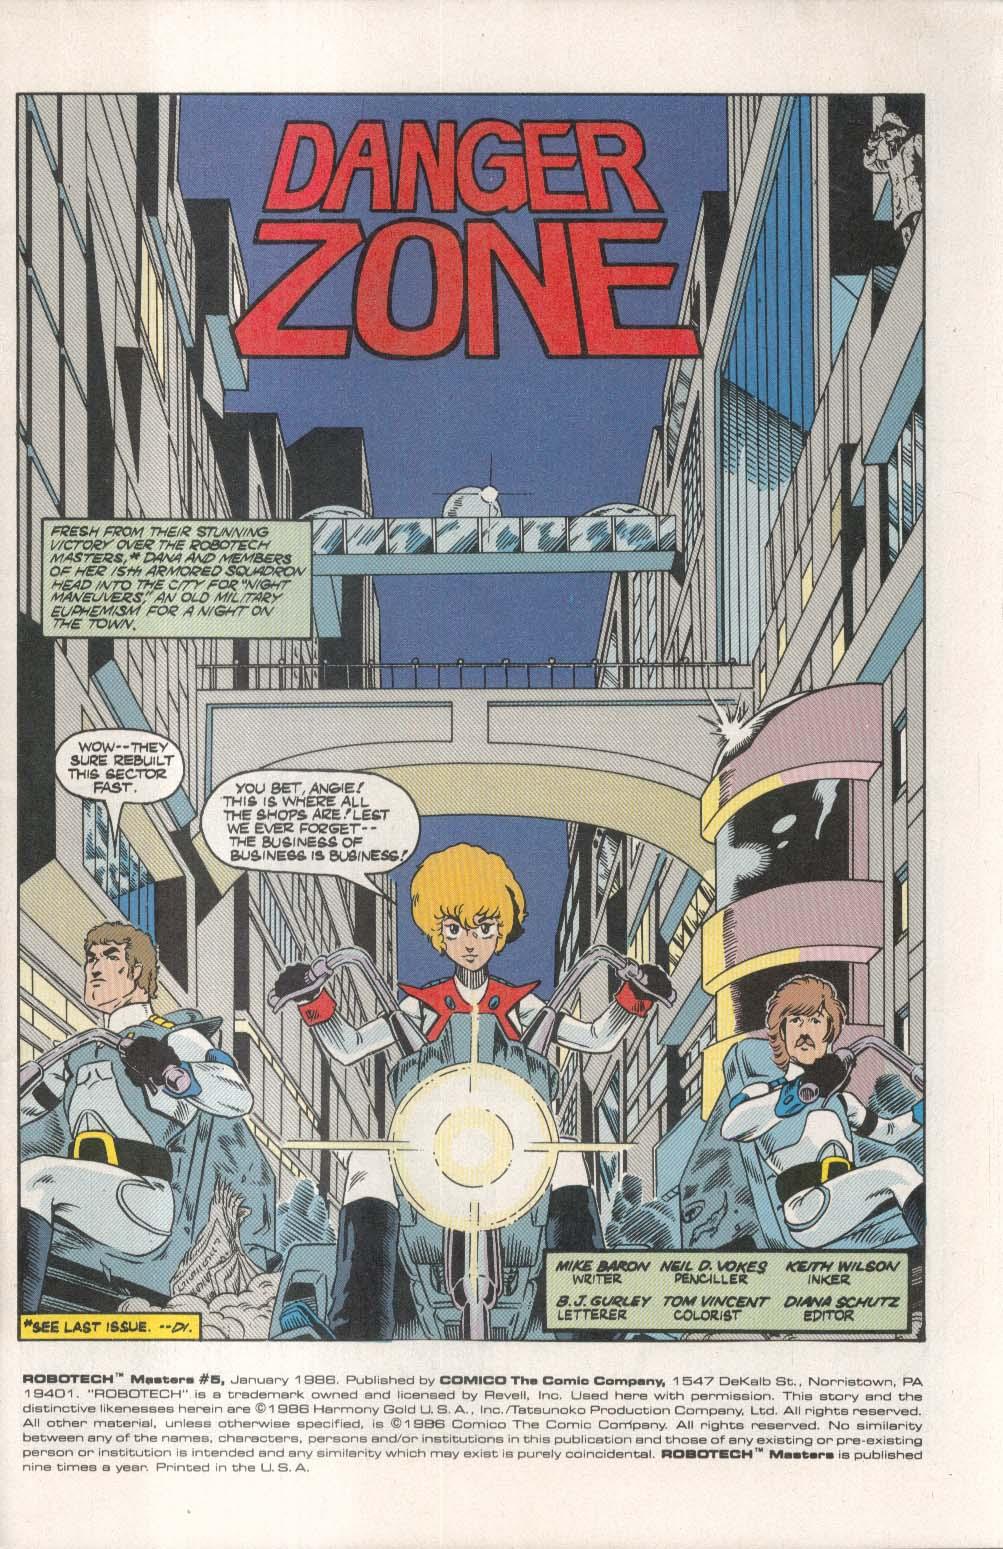 ROBOTECH Masters #5 Comico comic book 1 1986